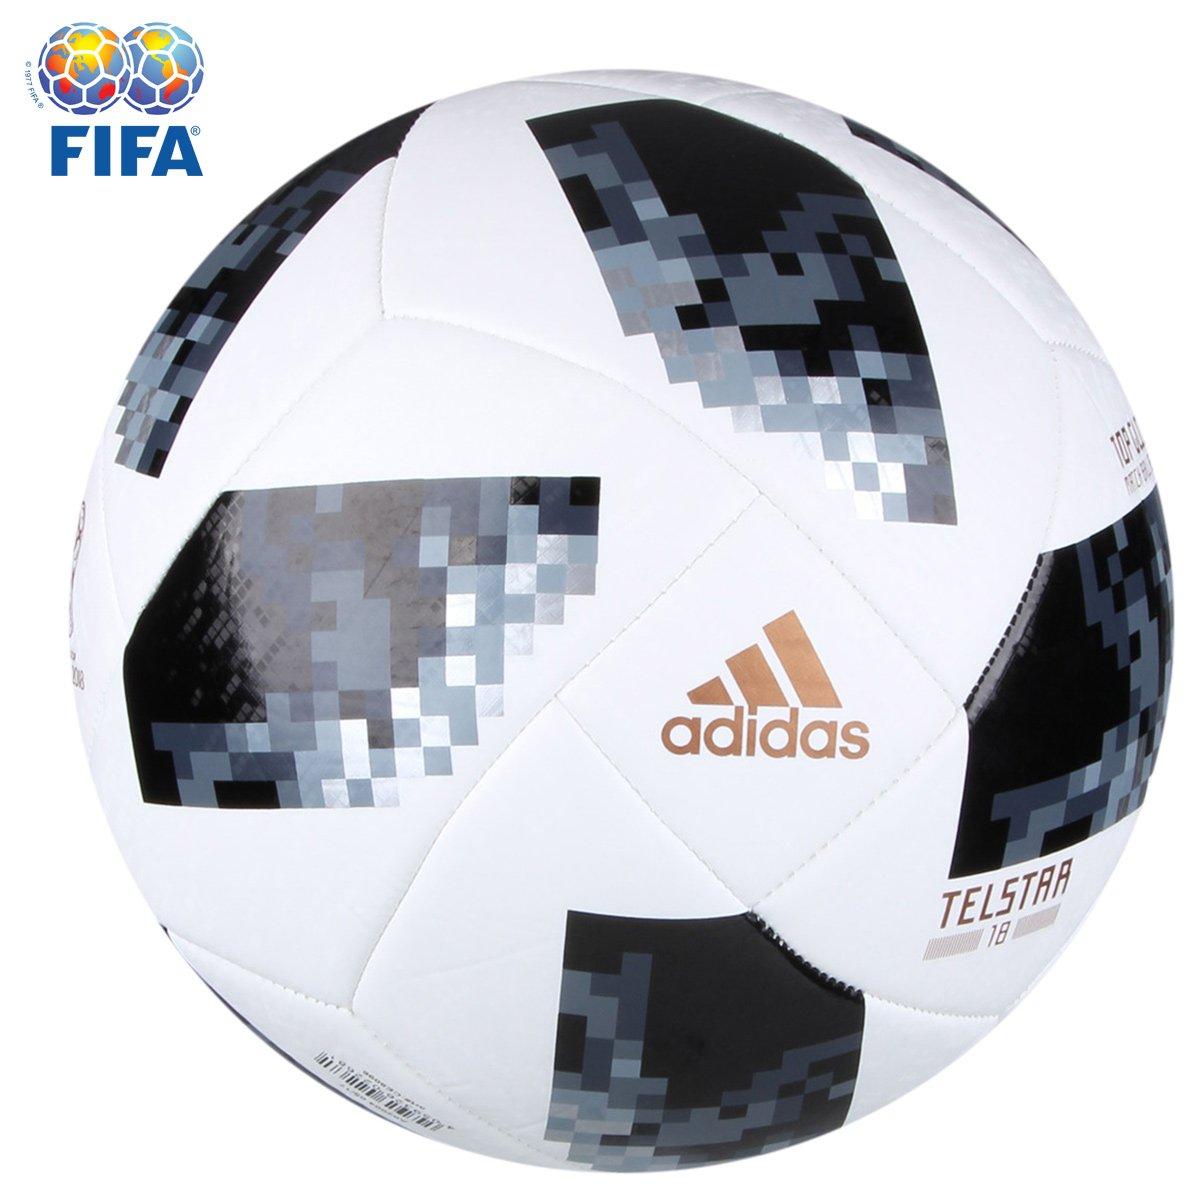 489b51918c960 Bola Futebol Campo Adidas Telstar 18 Top Glider Copa do Mundo FIFA - Branco  - Compre Agora